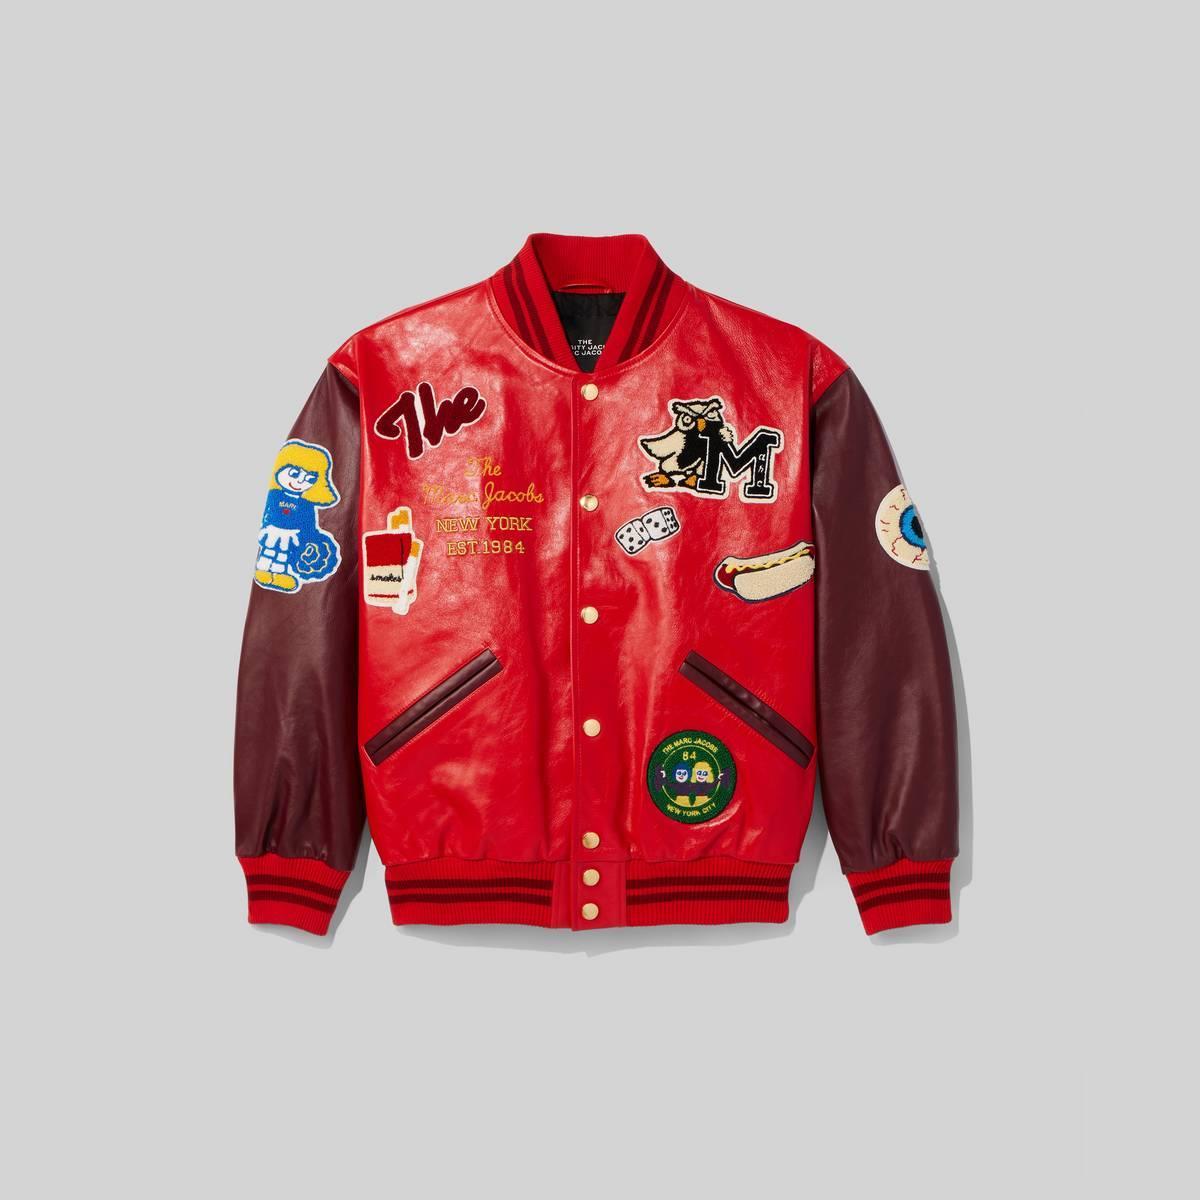 The Men's Varsity Jacket